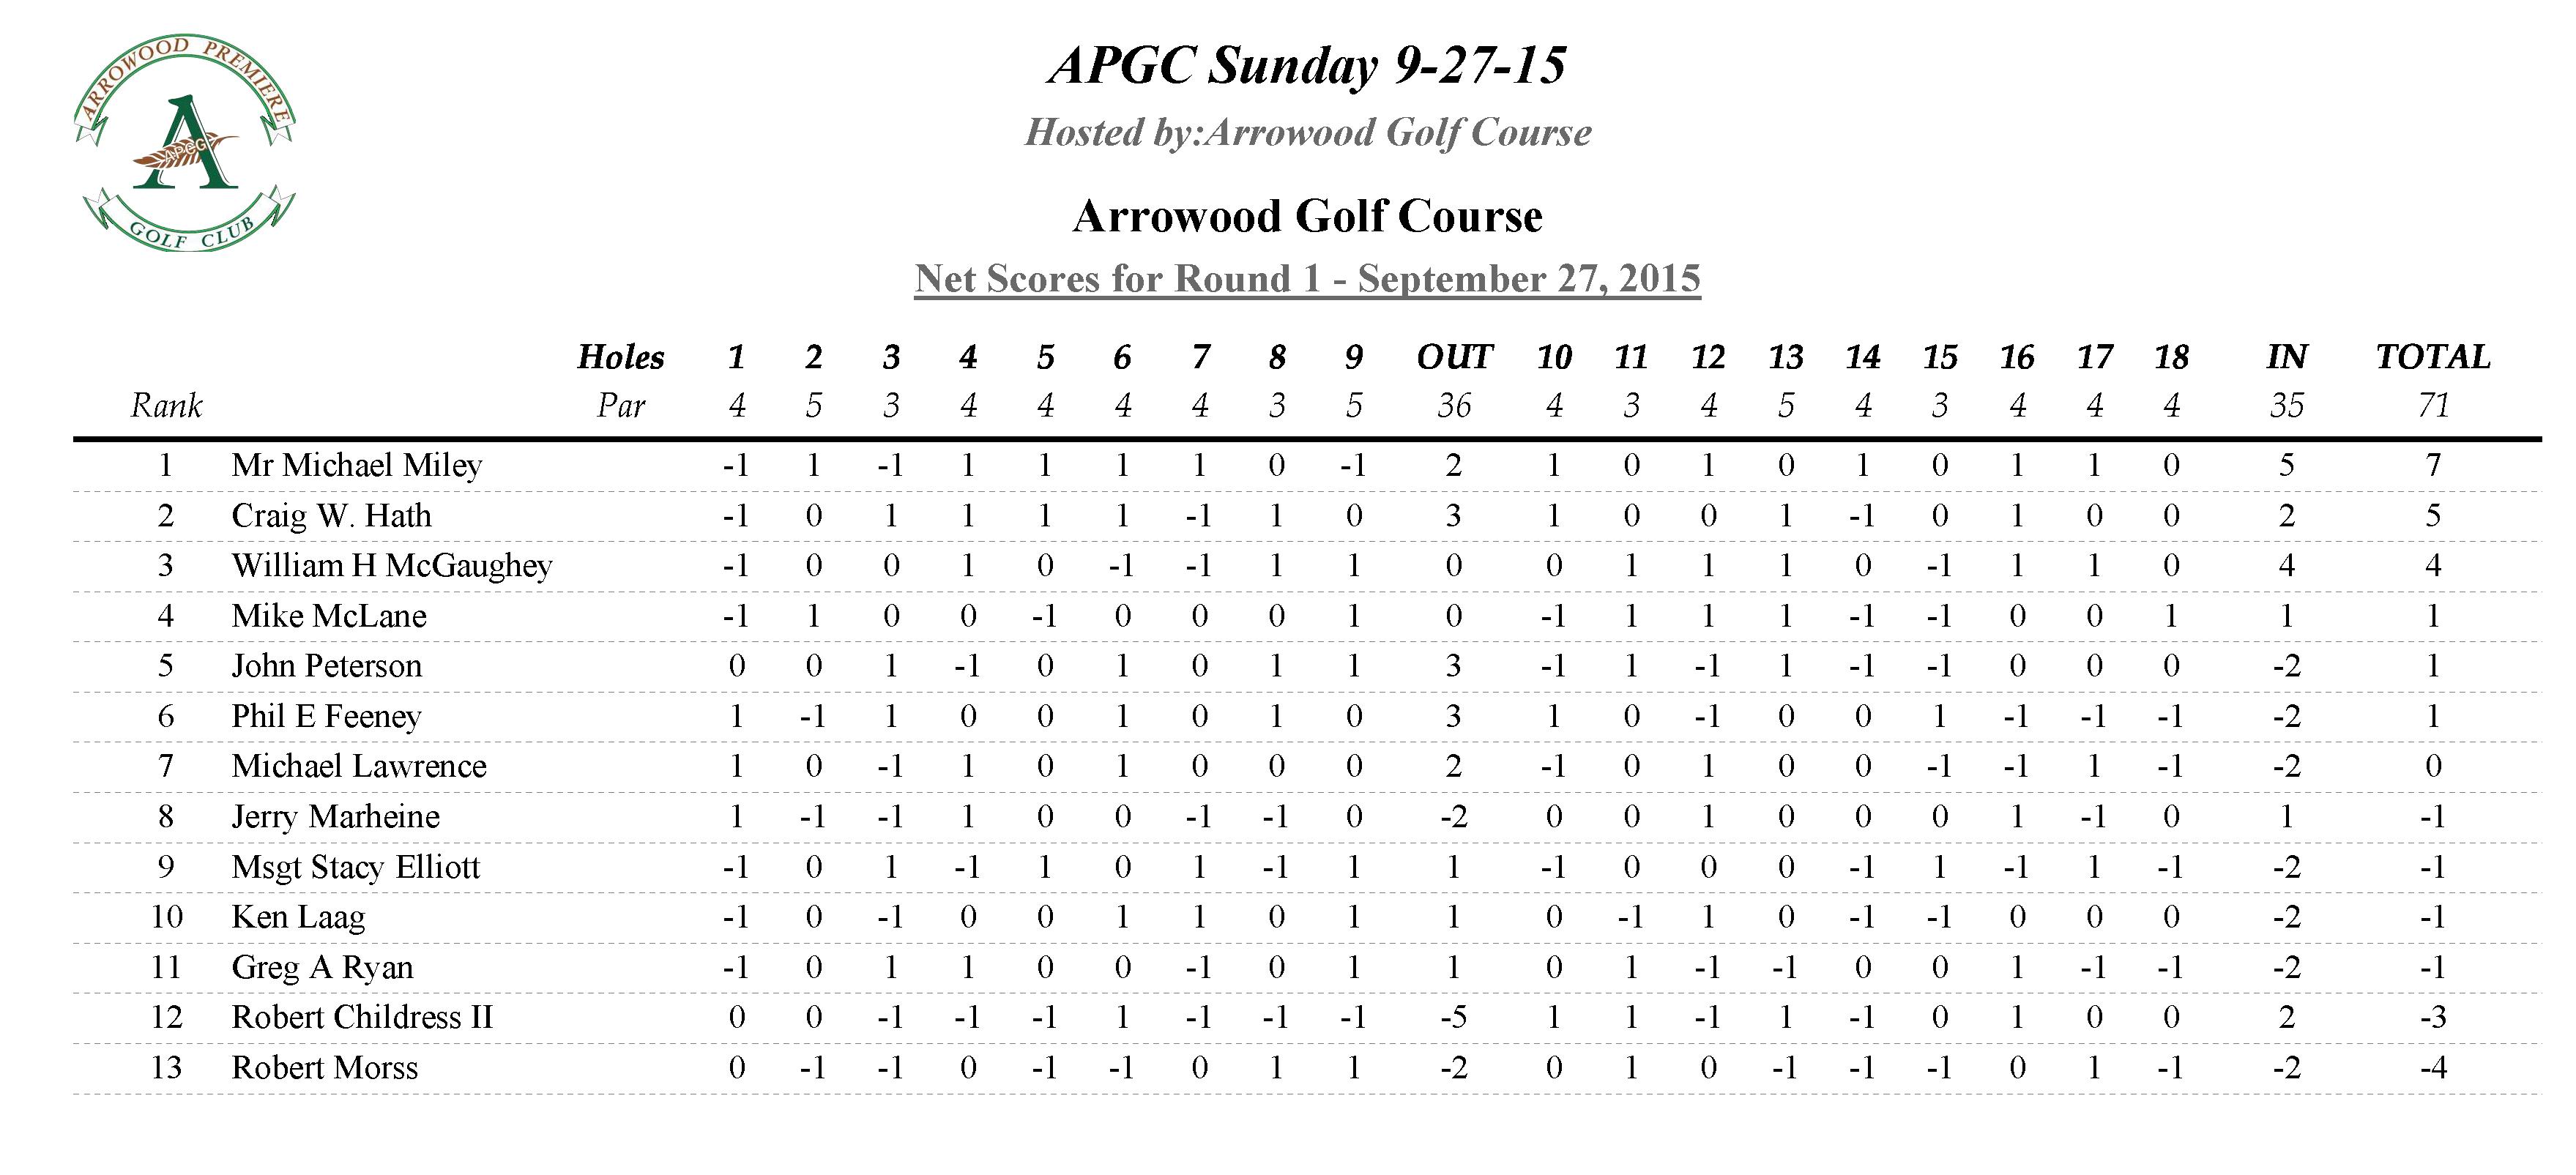 APGC Sunday 9-27-15